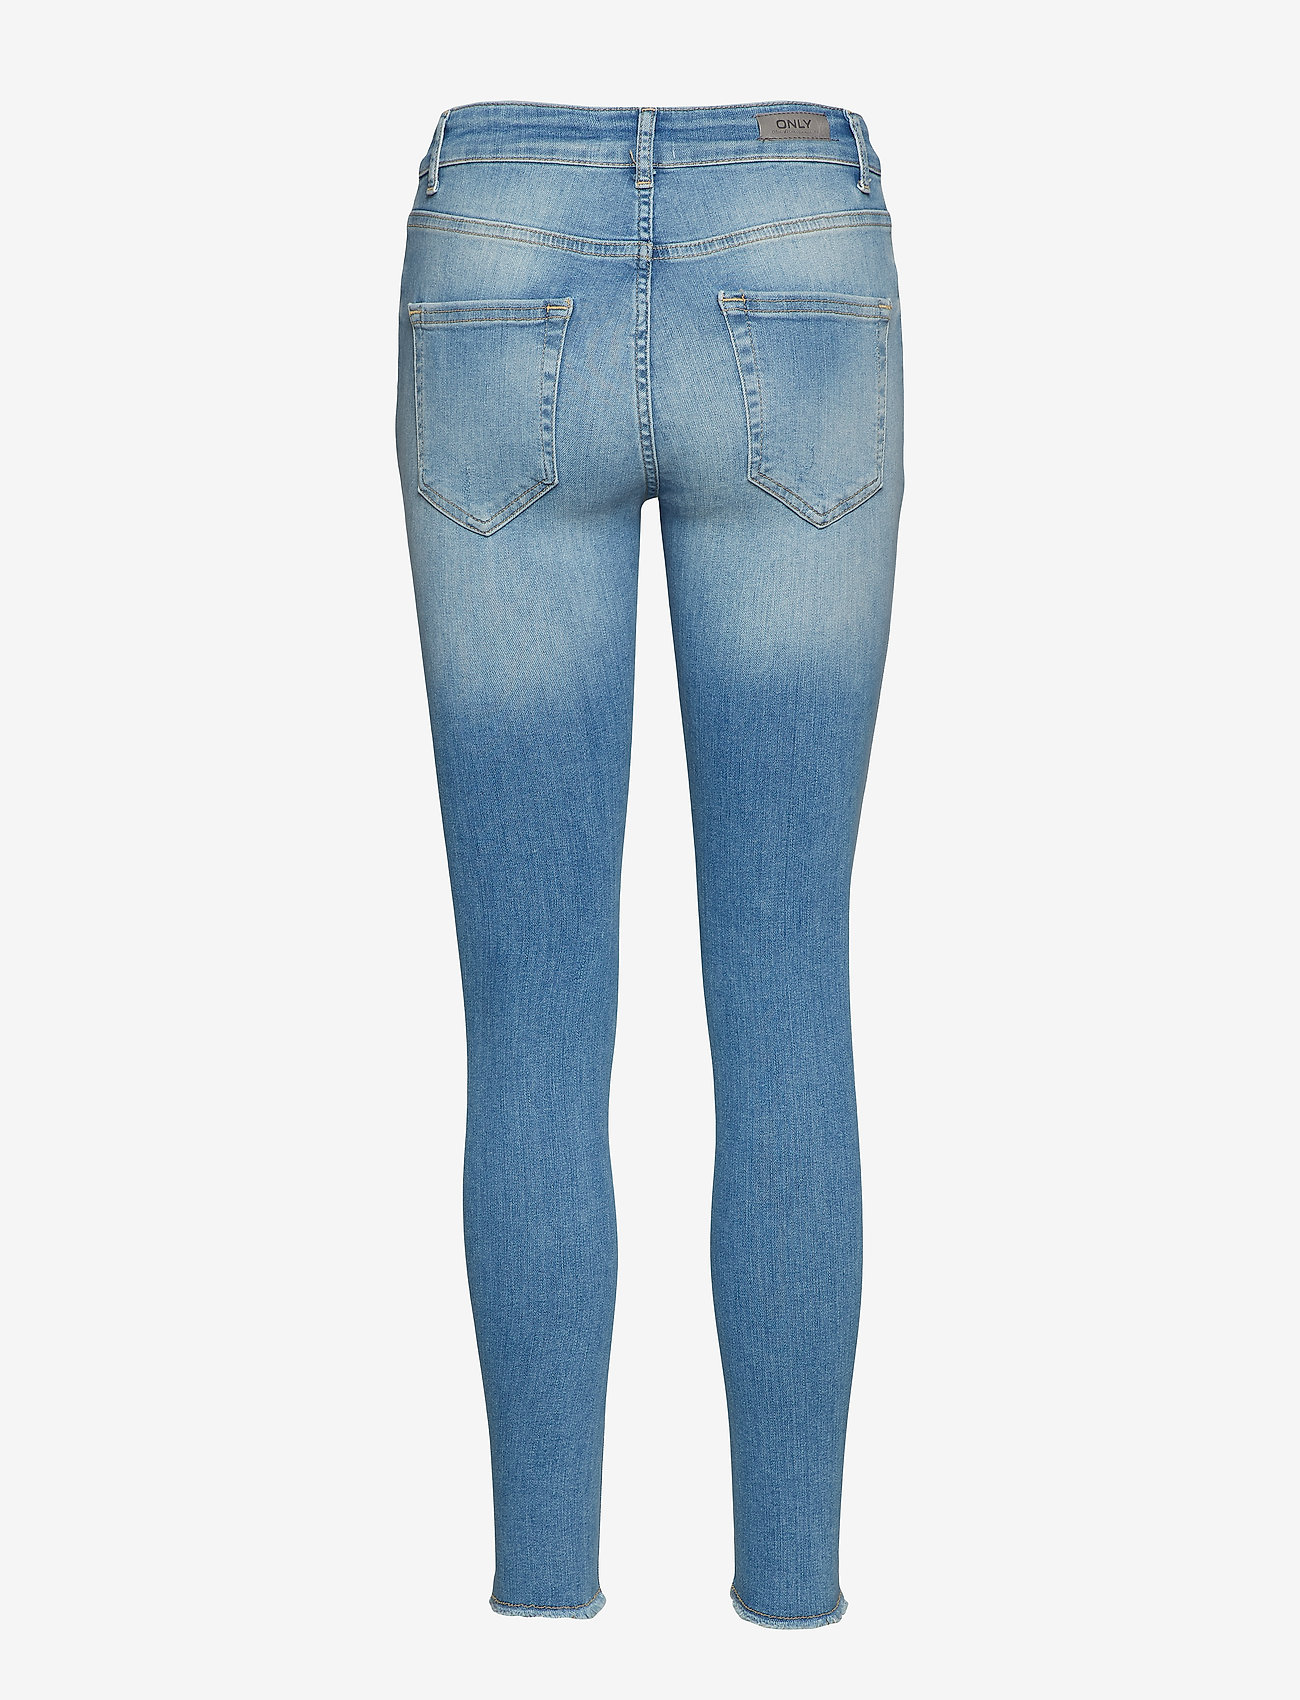 ONLY - ONLBLUSH LIFE MID SK AK RAW REA1467 NOOS - skinny jeans - light blue denim